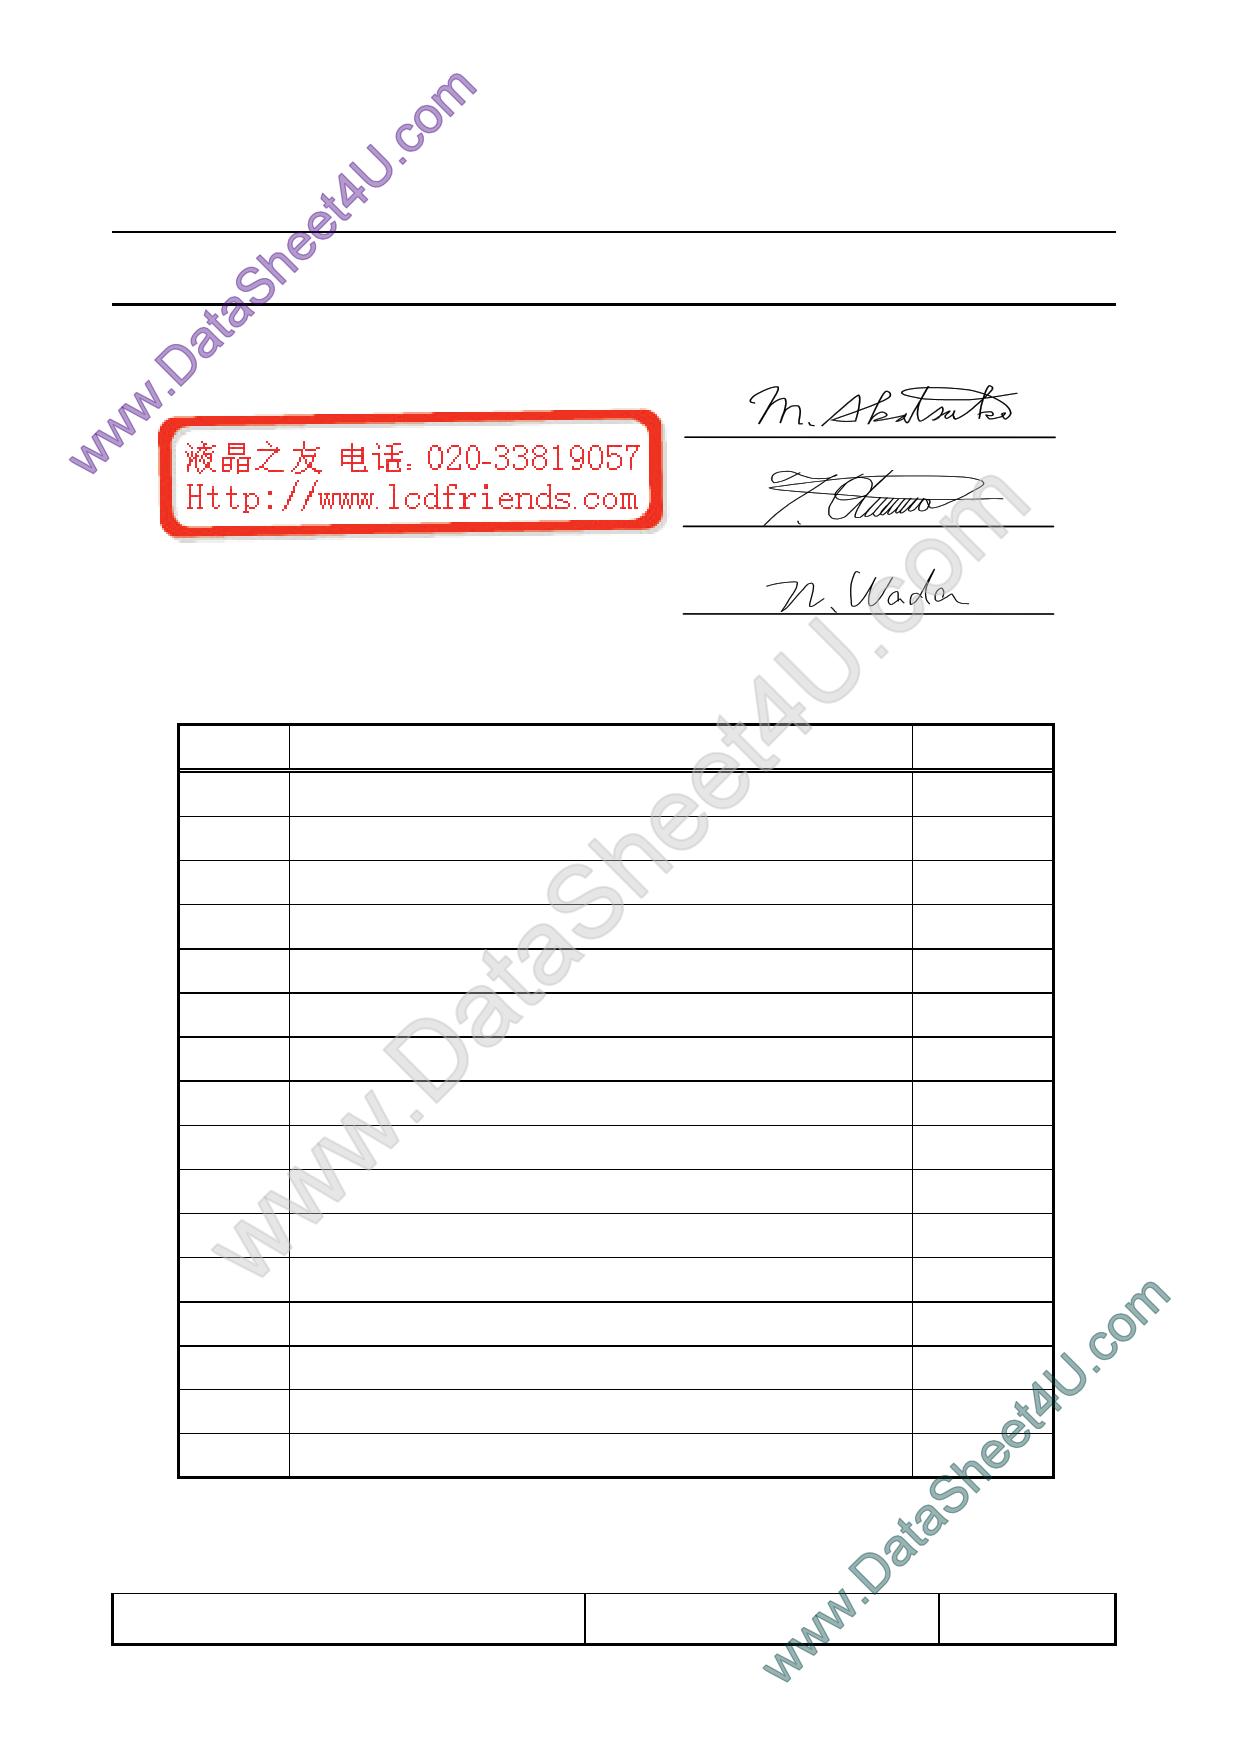 T-51512D121J-FE-A-AC دیتاشیت PDF